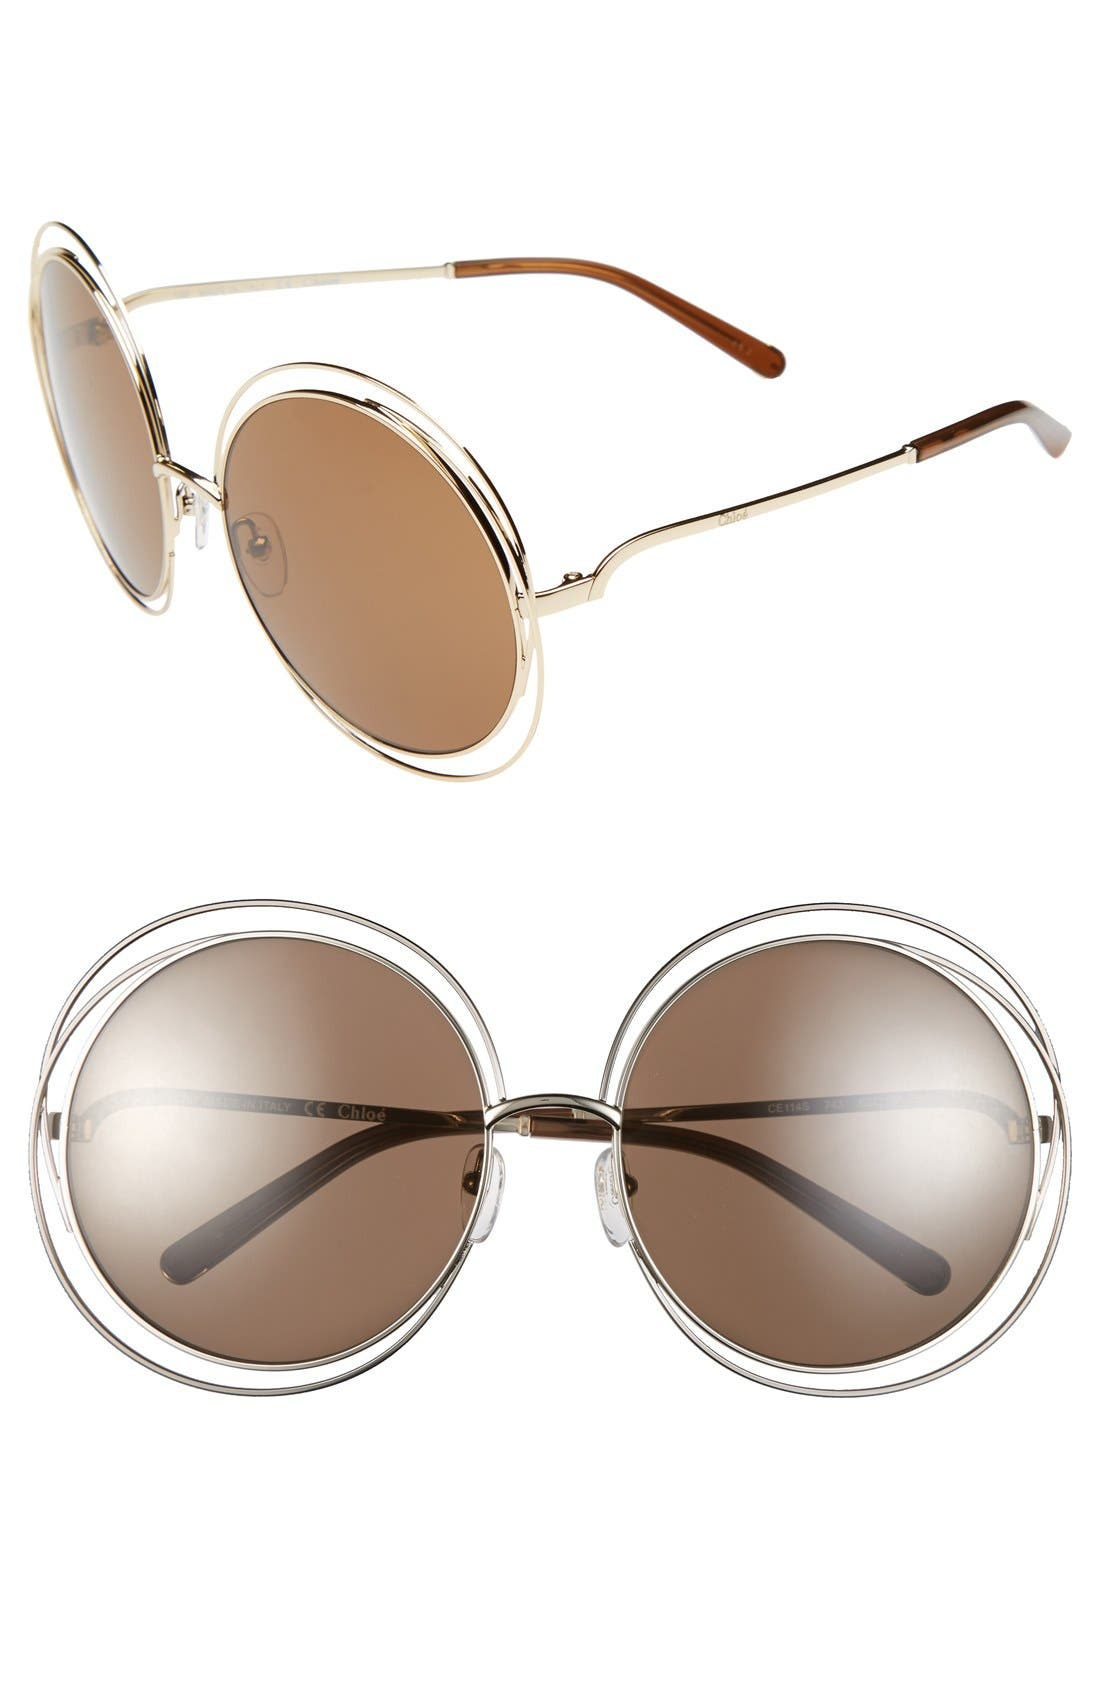 Main Image - Chloé 62mm Oversize Sunglasses